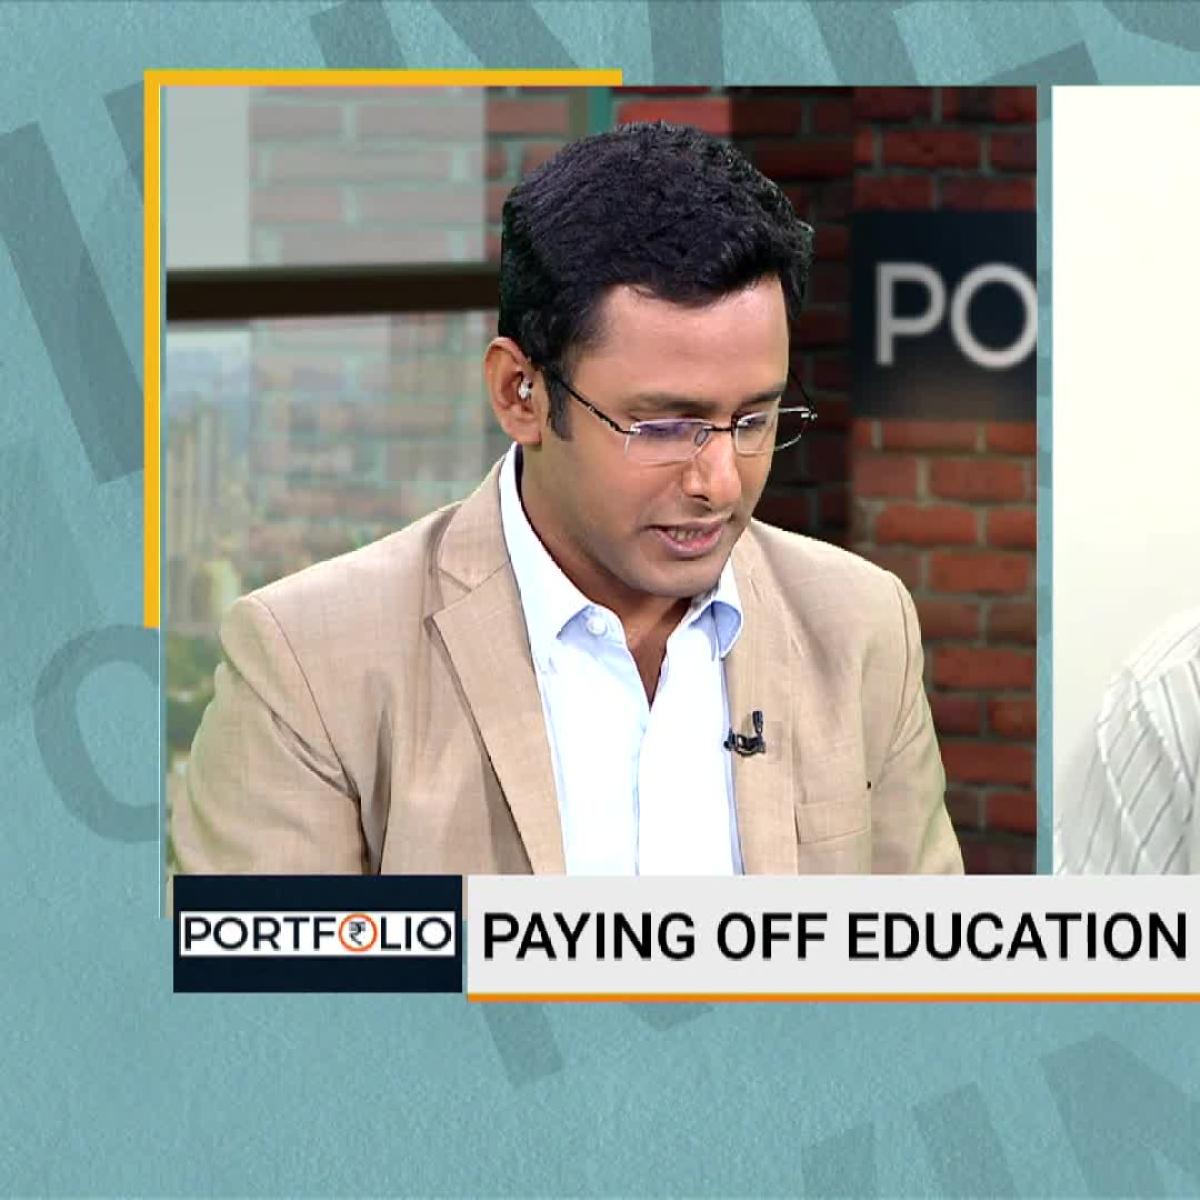 BQPortfolio: Splitting The Salary Between Loan Repayment & Some Indulgences